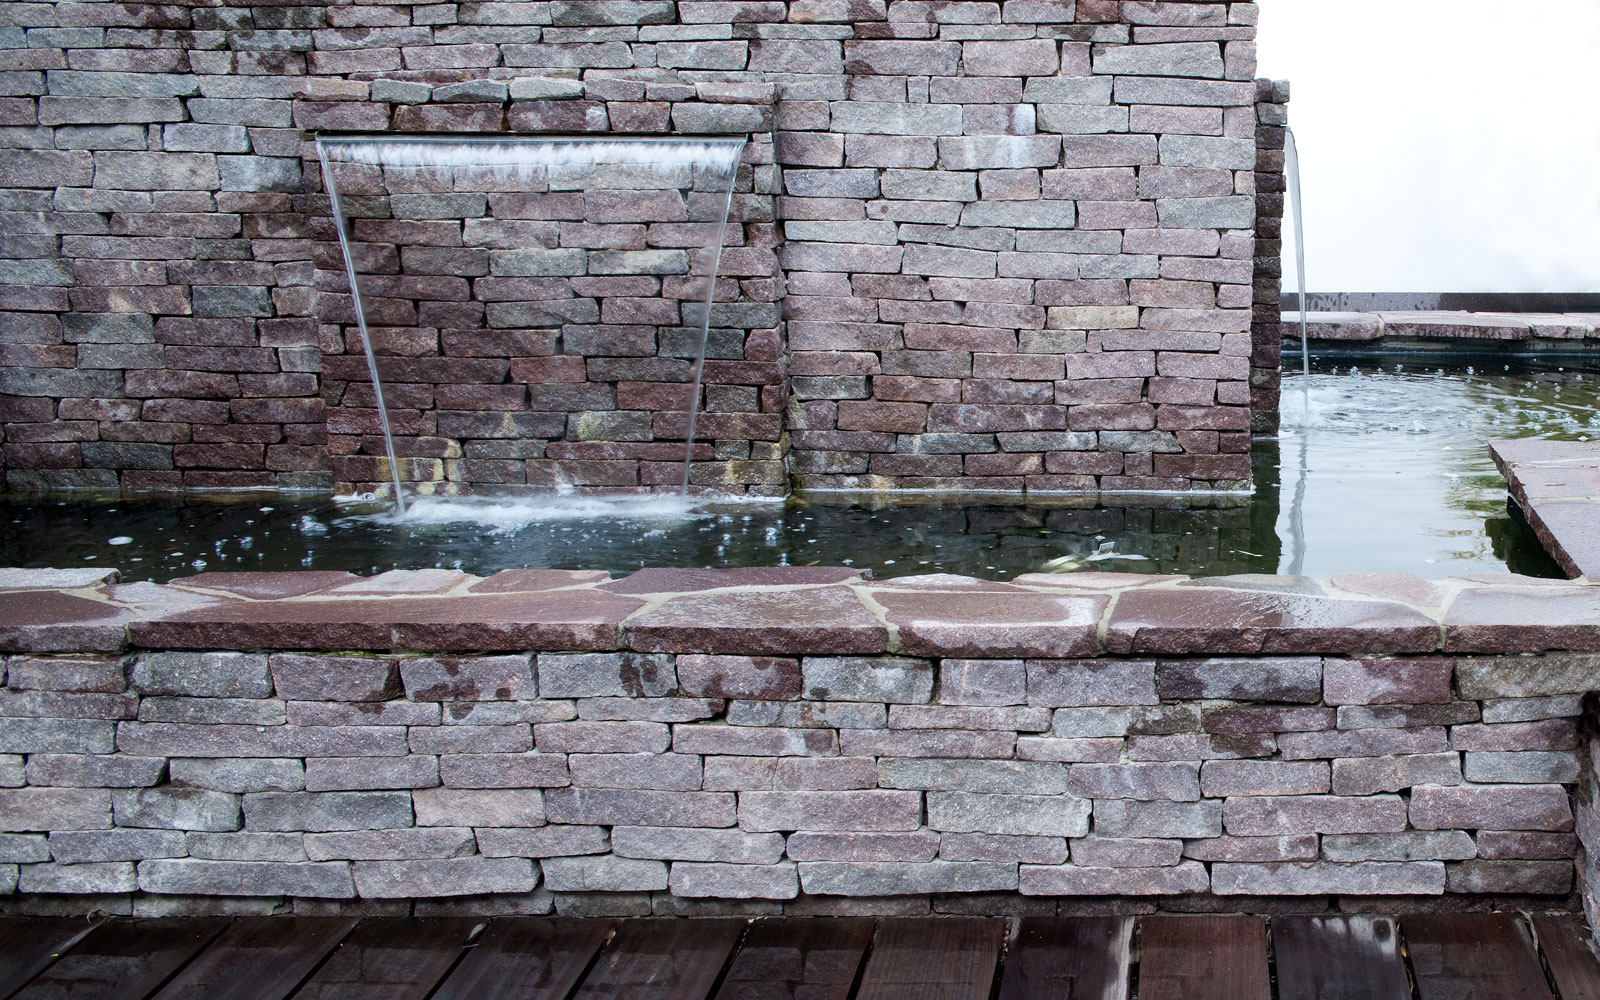 Tuin, mediterraans, stenen muur, Poortvliet en Partners, Ginkel Groep, waterval, riante villa, Leeflang Architectuur